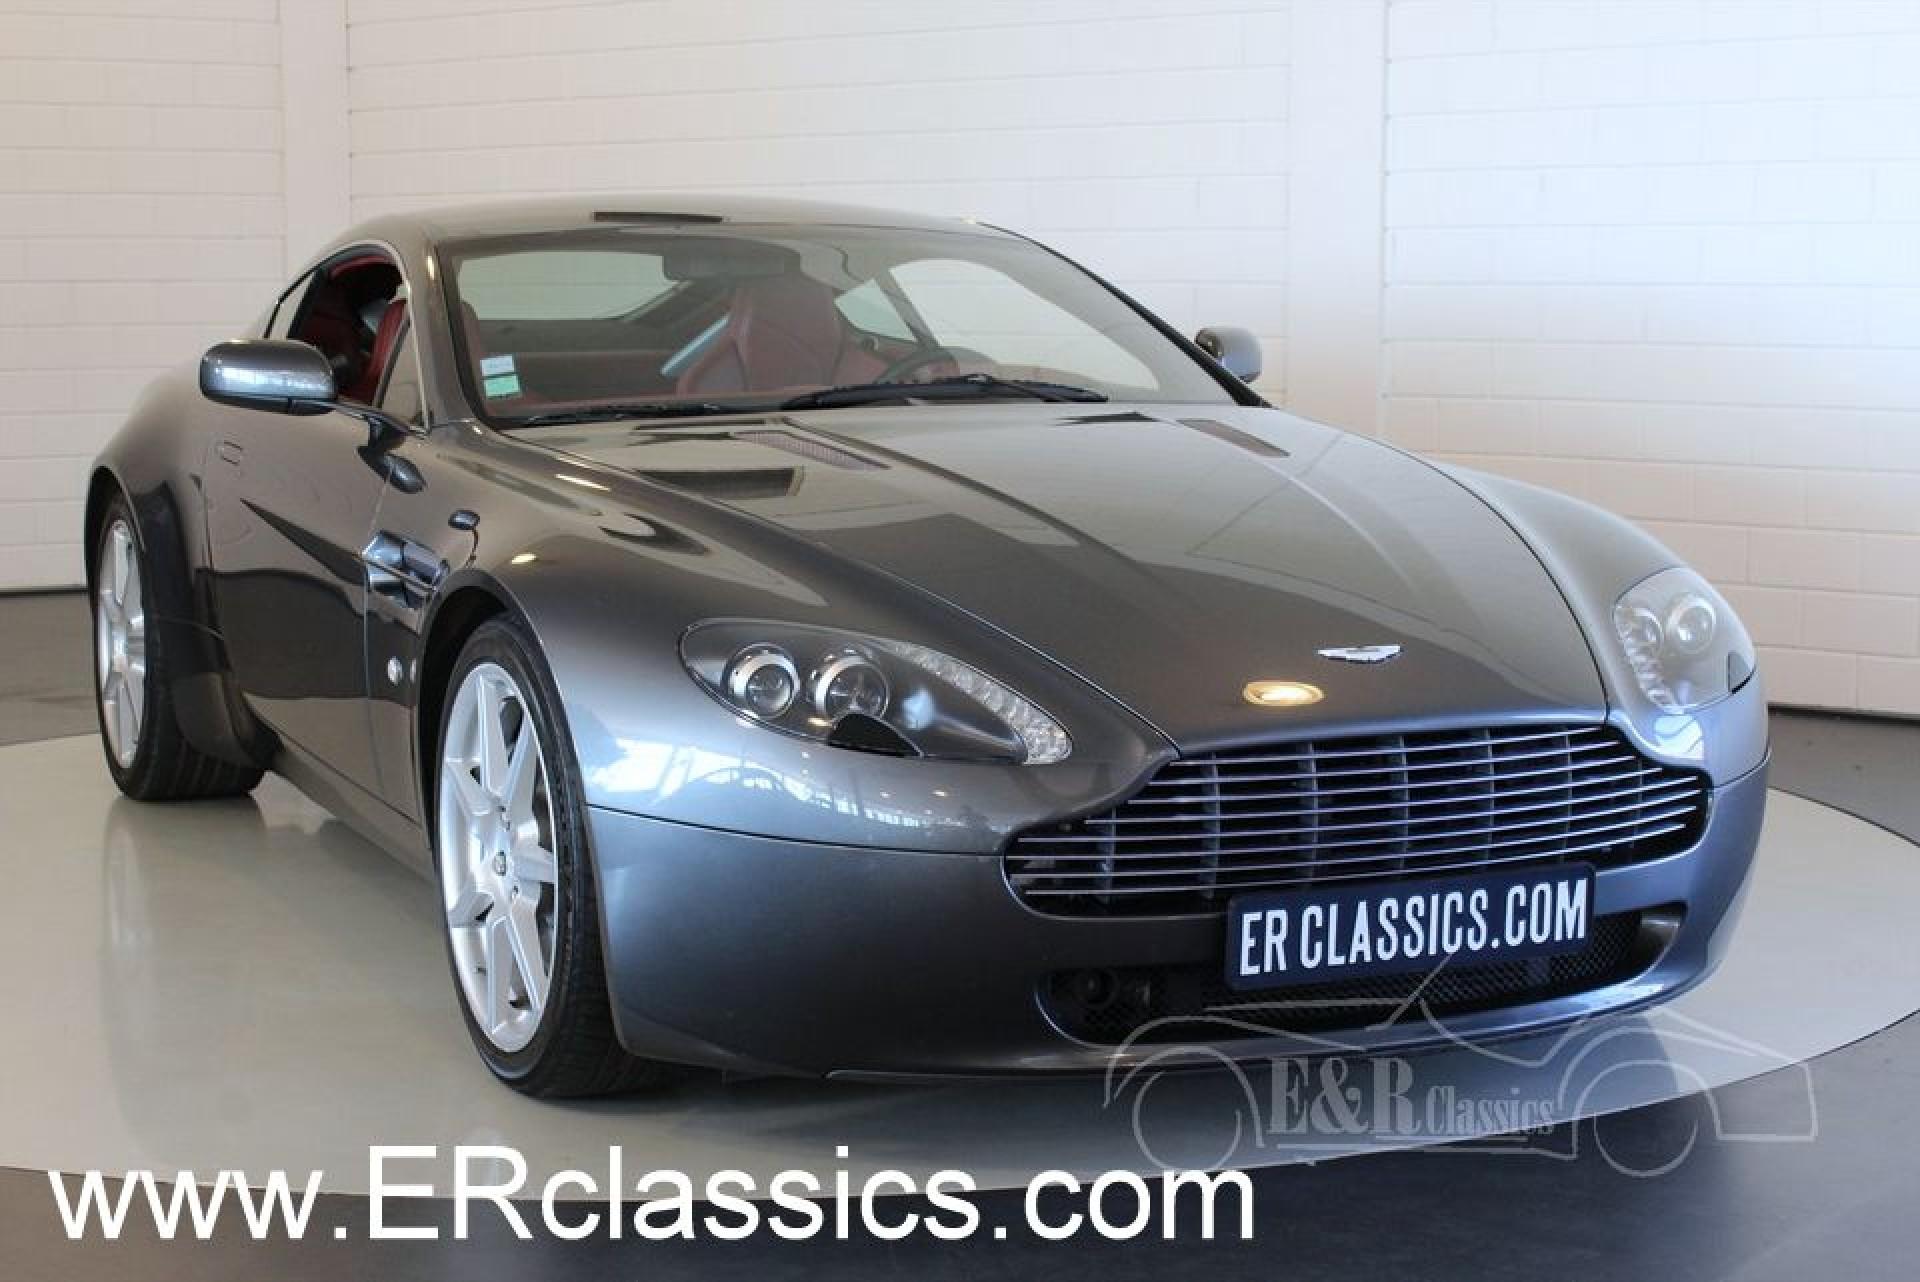 Aston Martin V8 Vantage 2006 Coupe For Sale At Erclassics